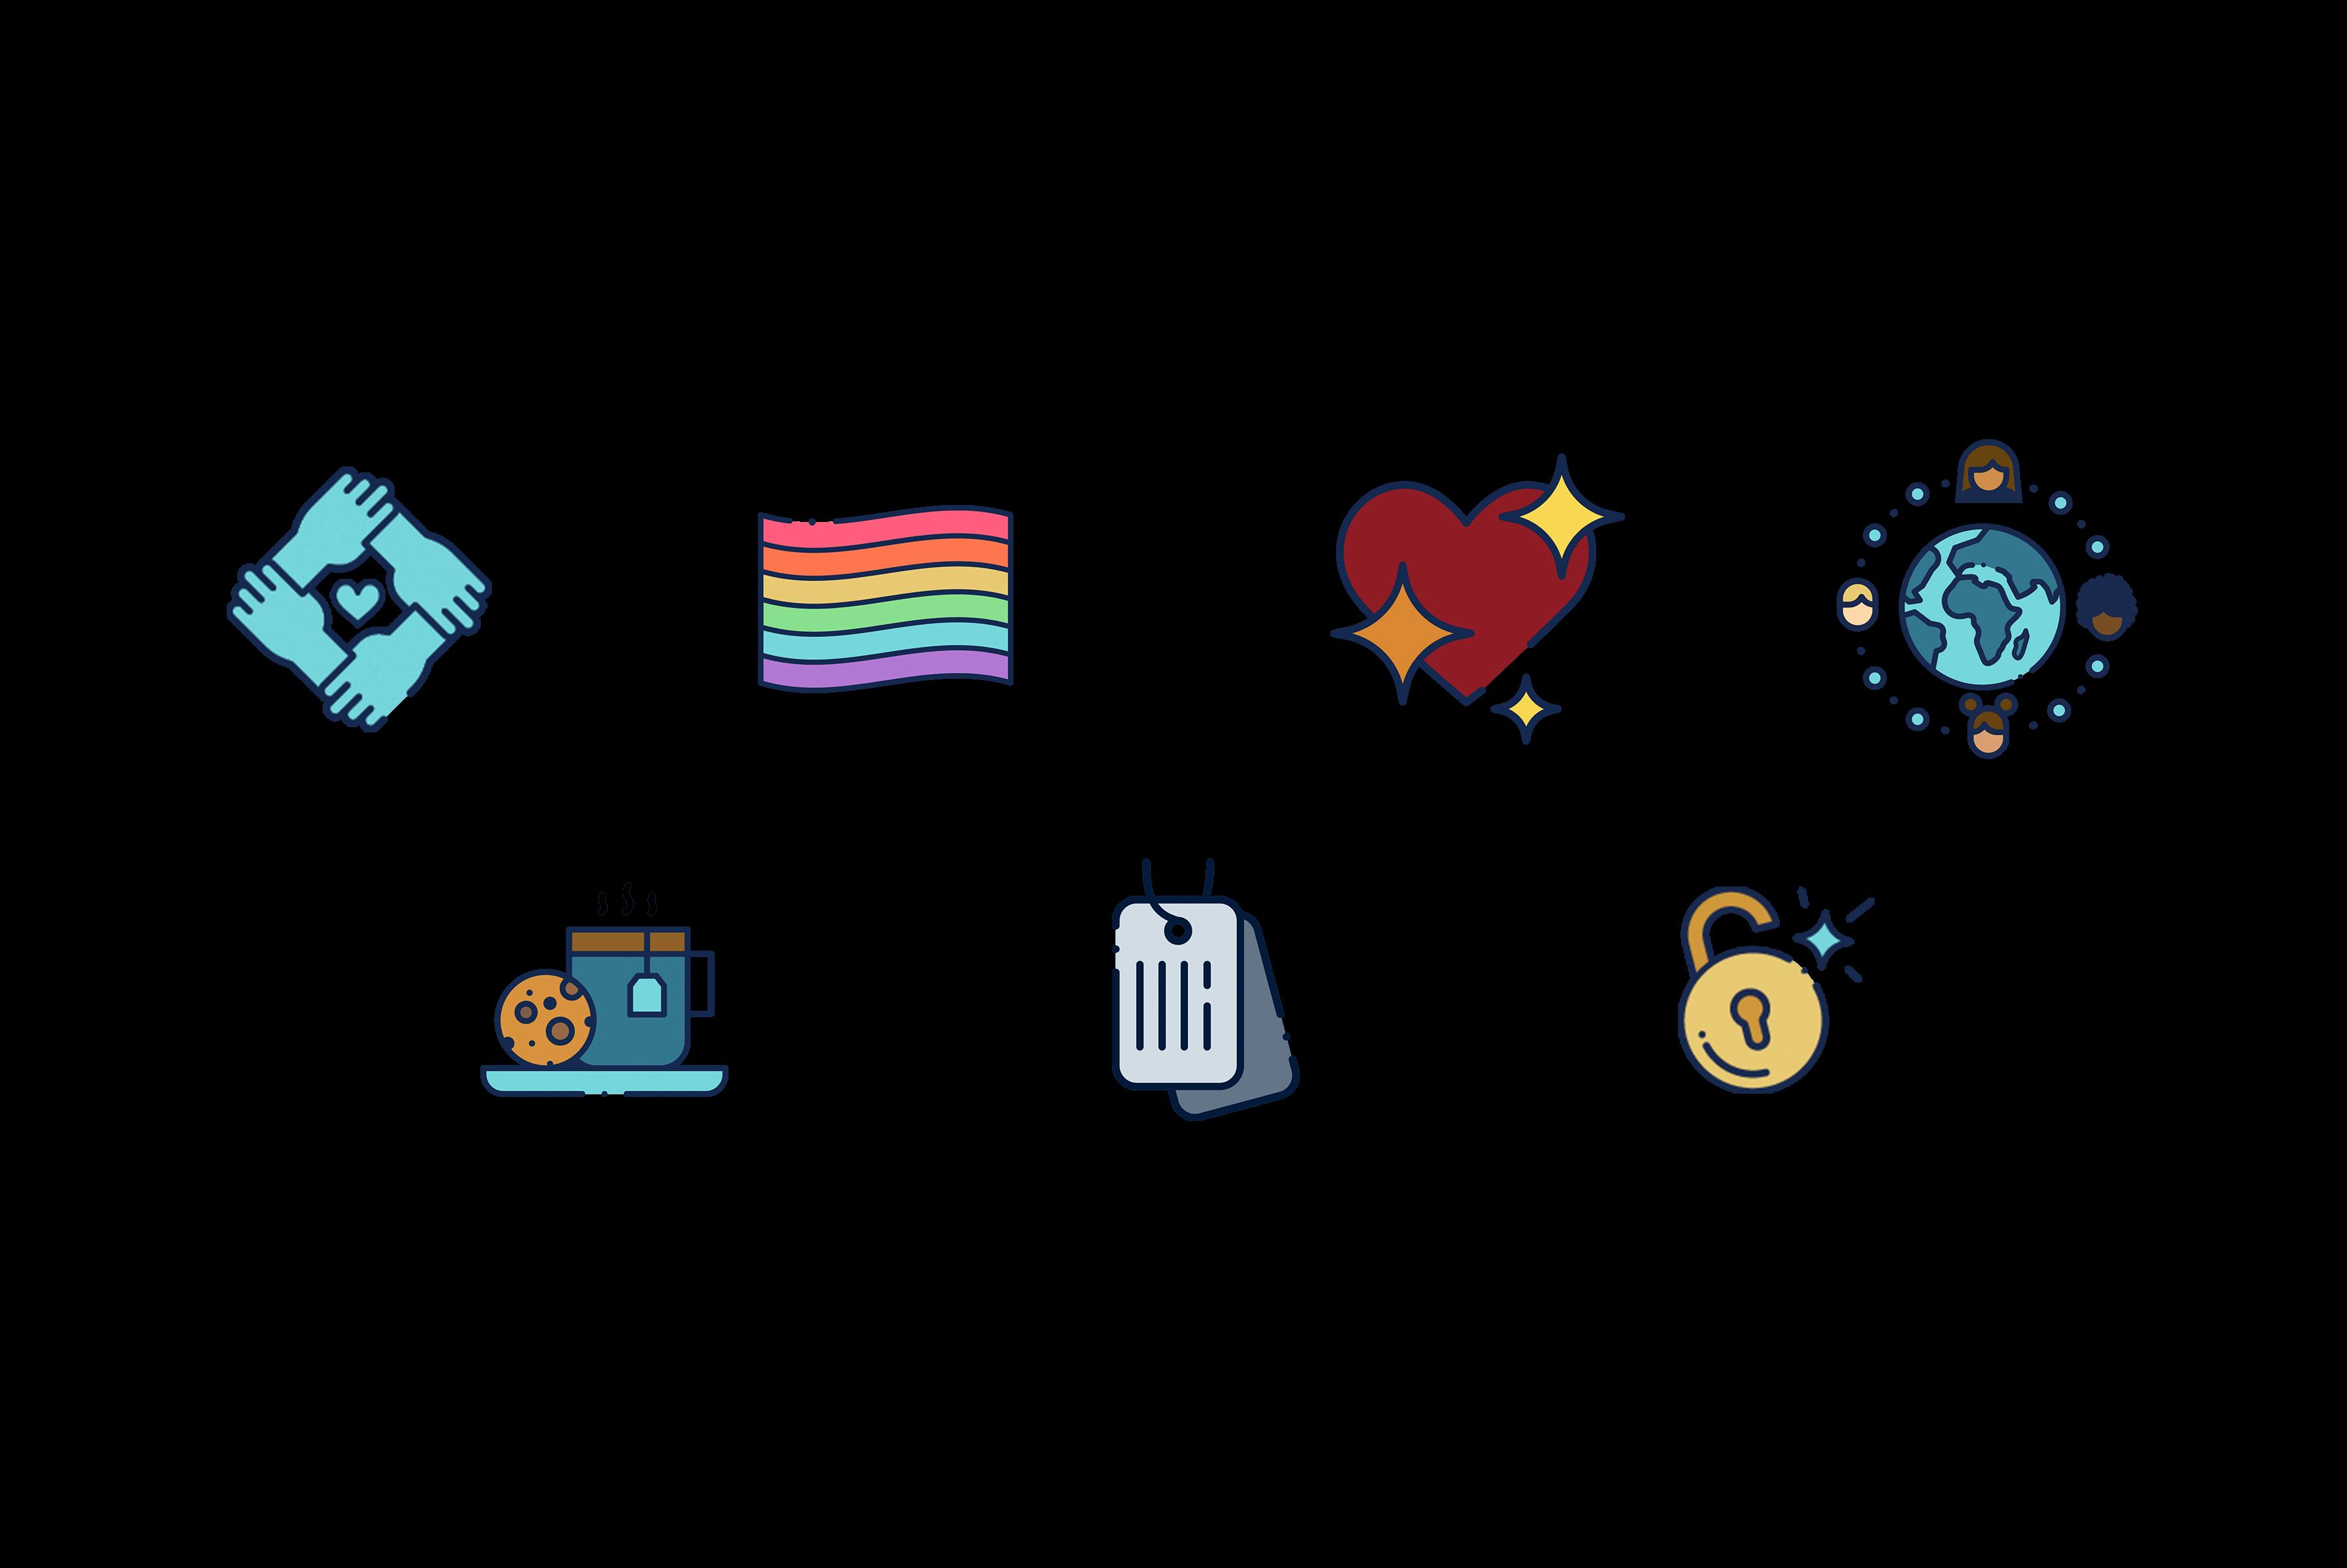 esrg icons